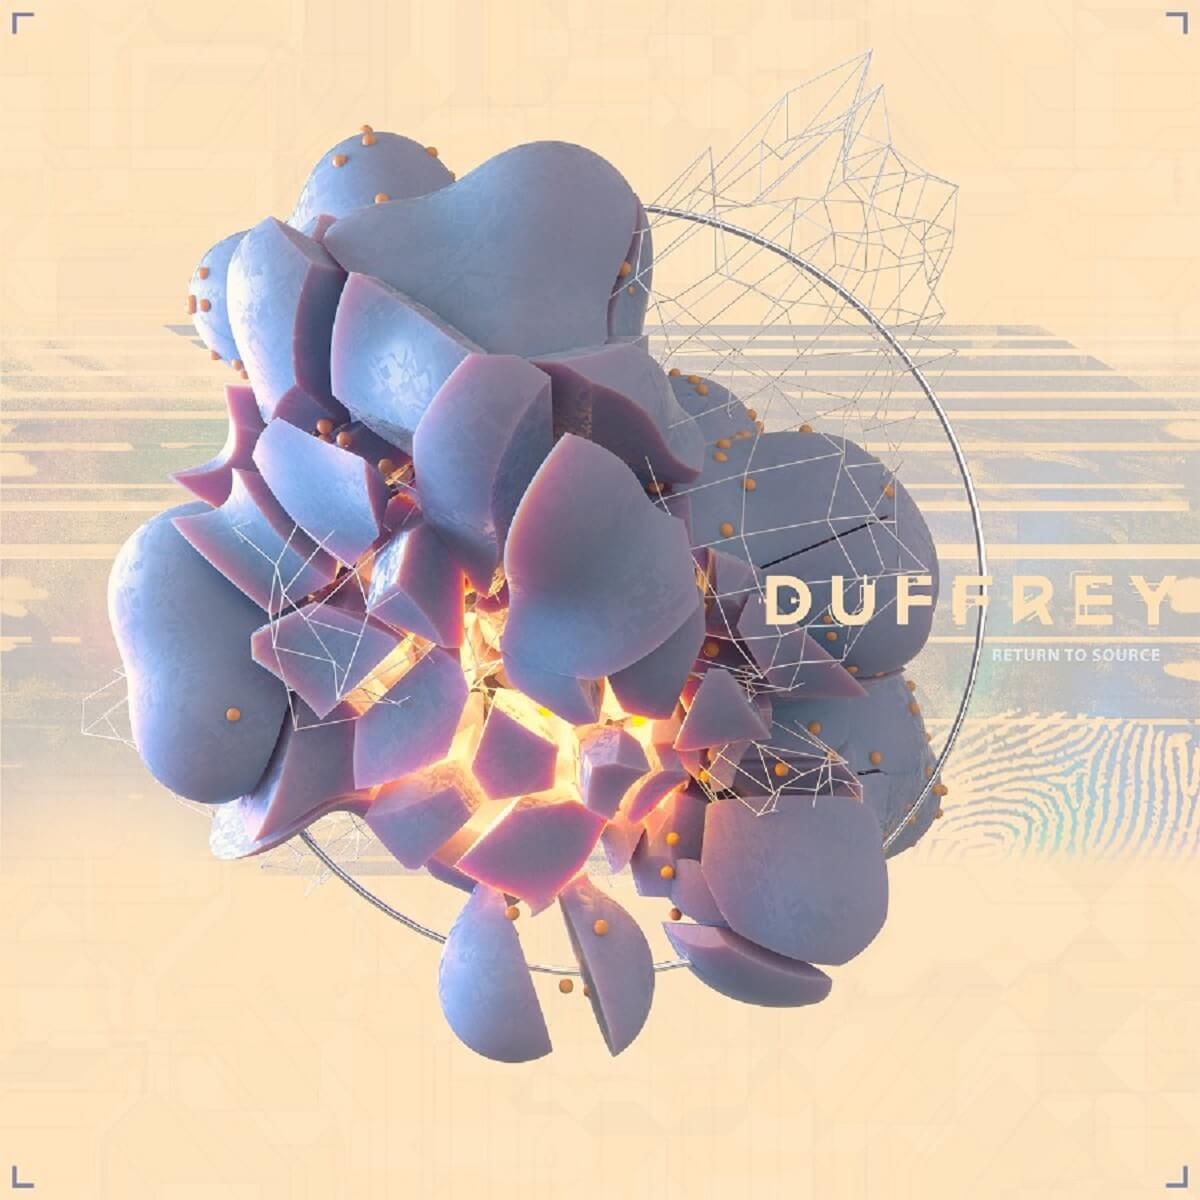 Duffrey Return to Source EP